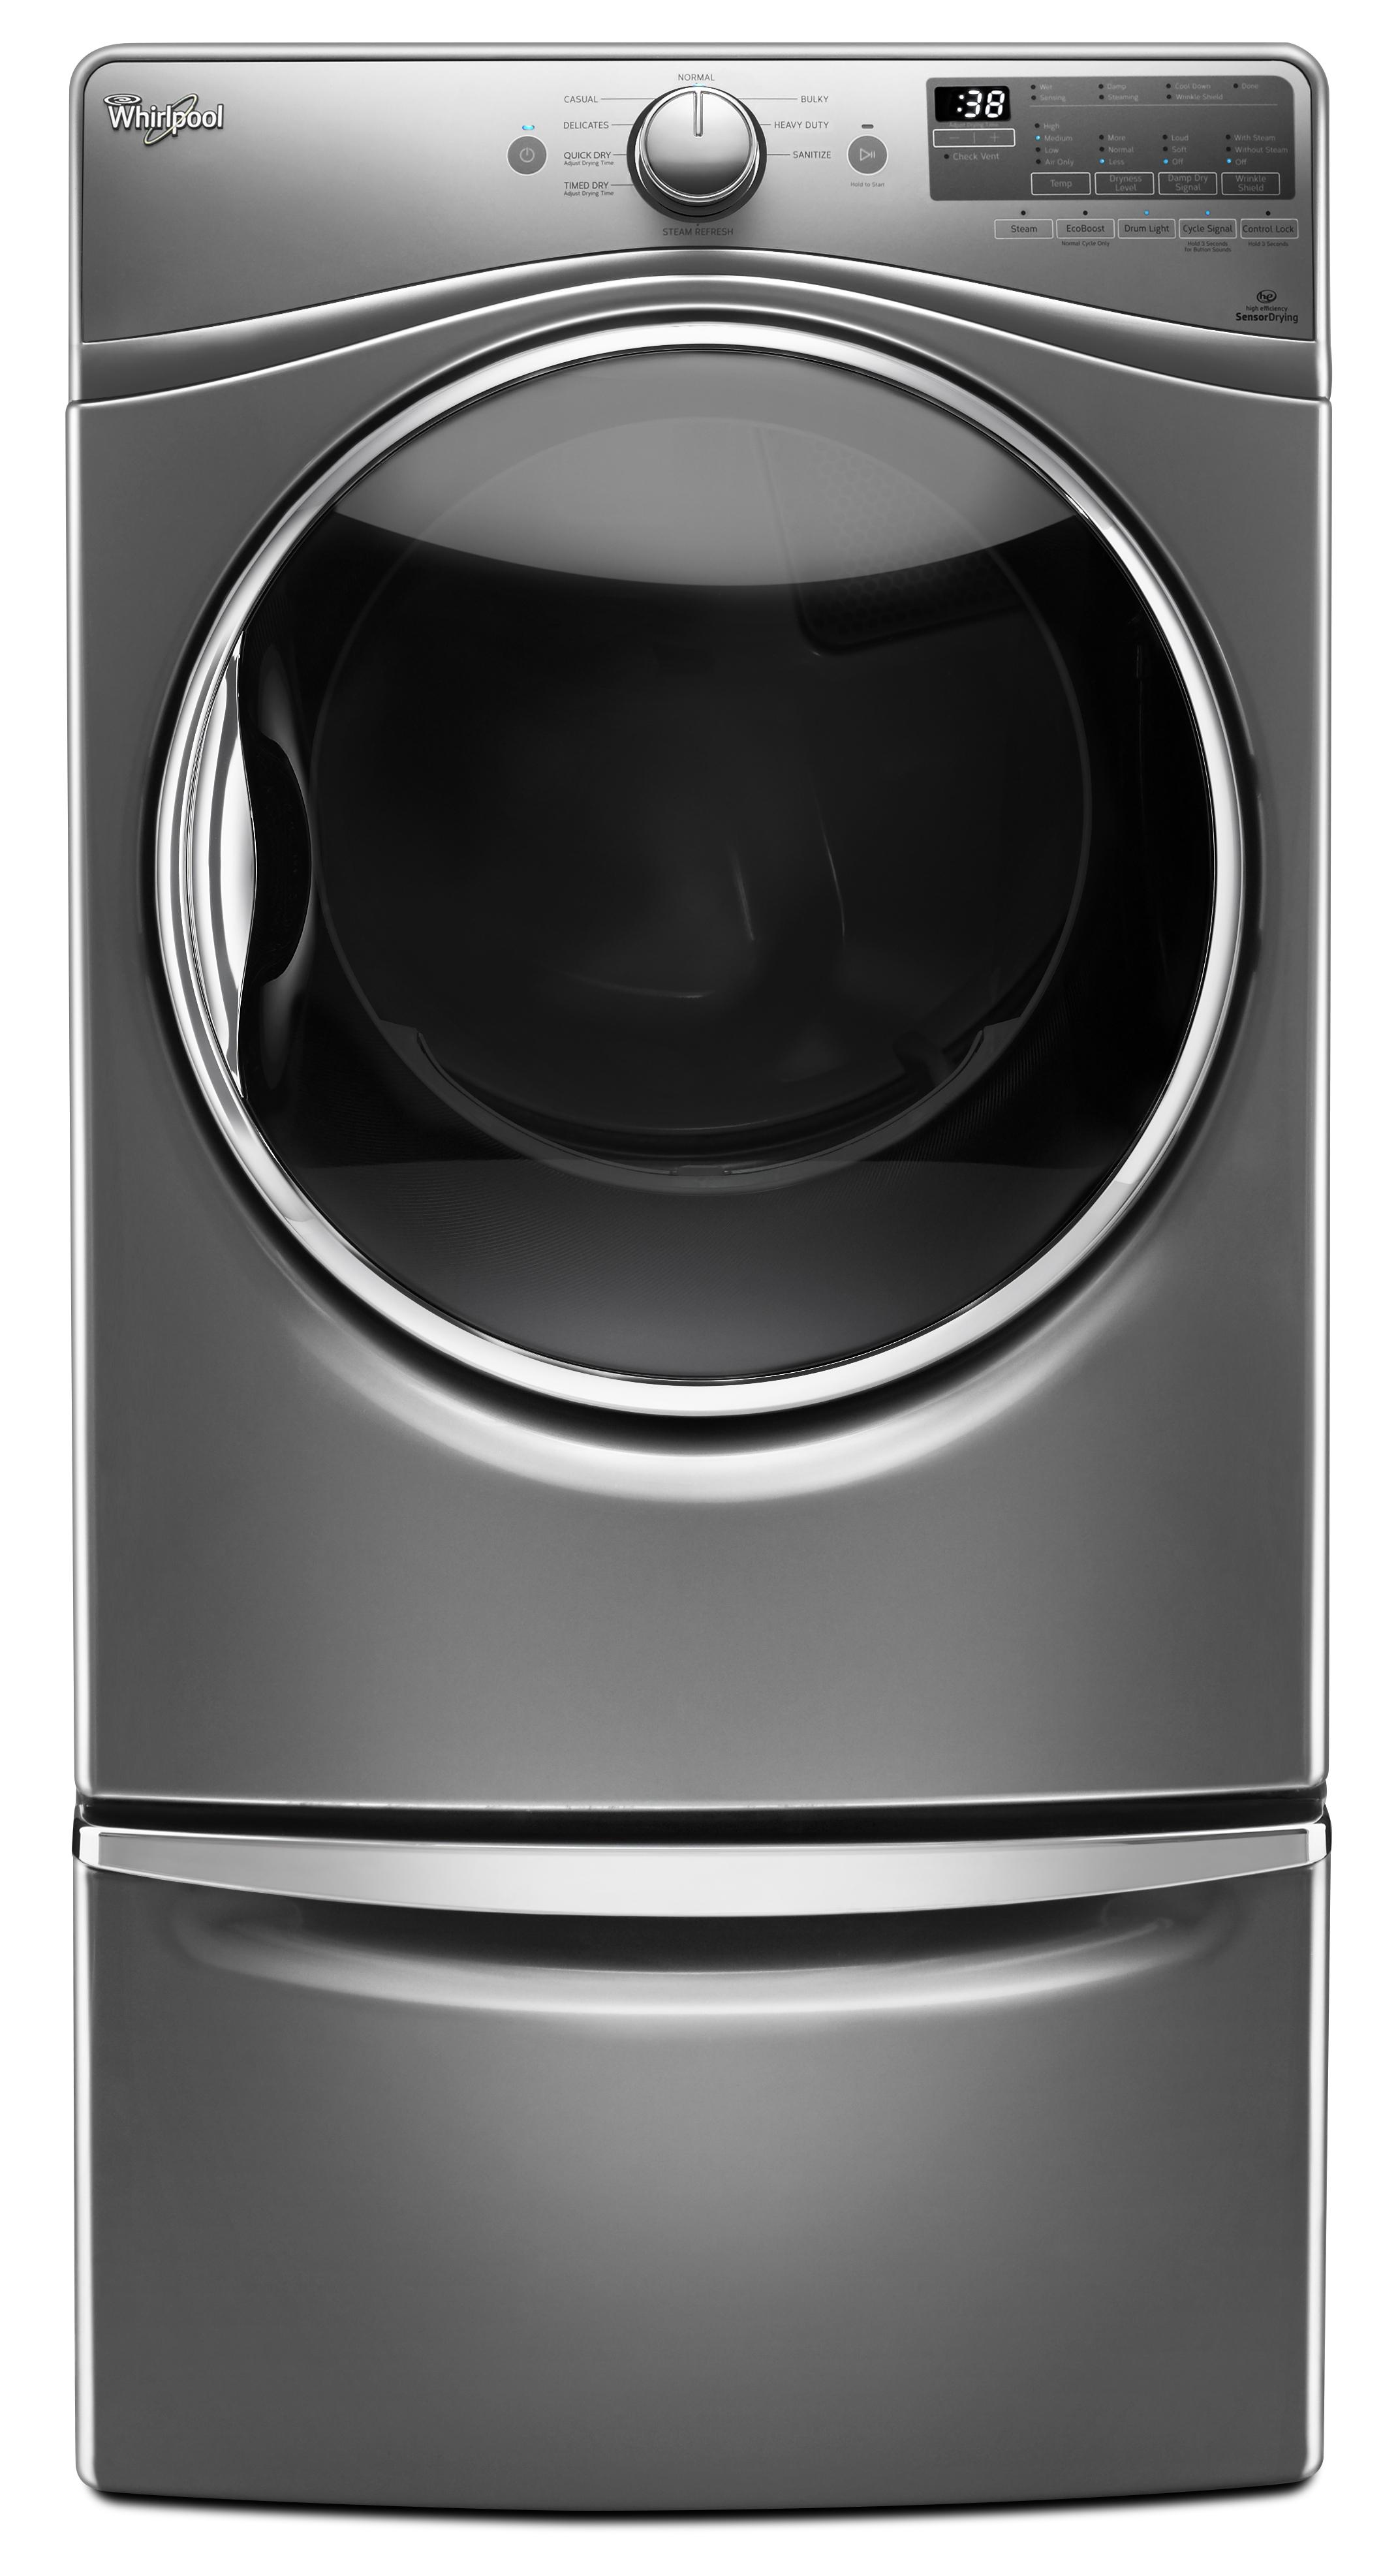 Whirlpool WGD90HEFC 7.4 cu. ft. Gas Dryer - Chrome Shadow